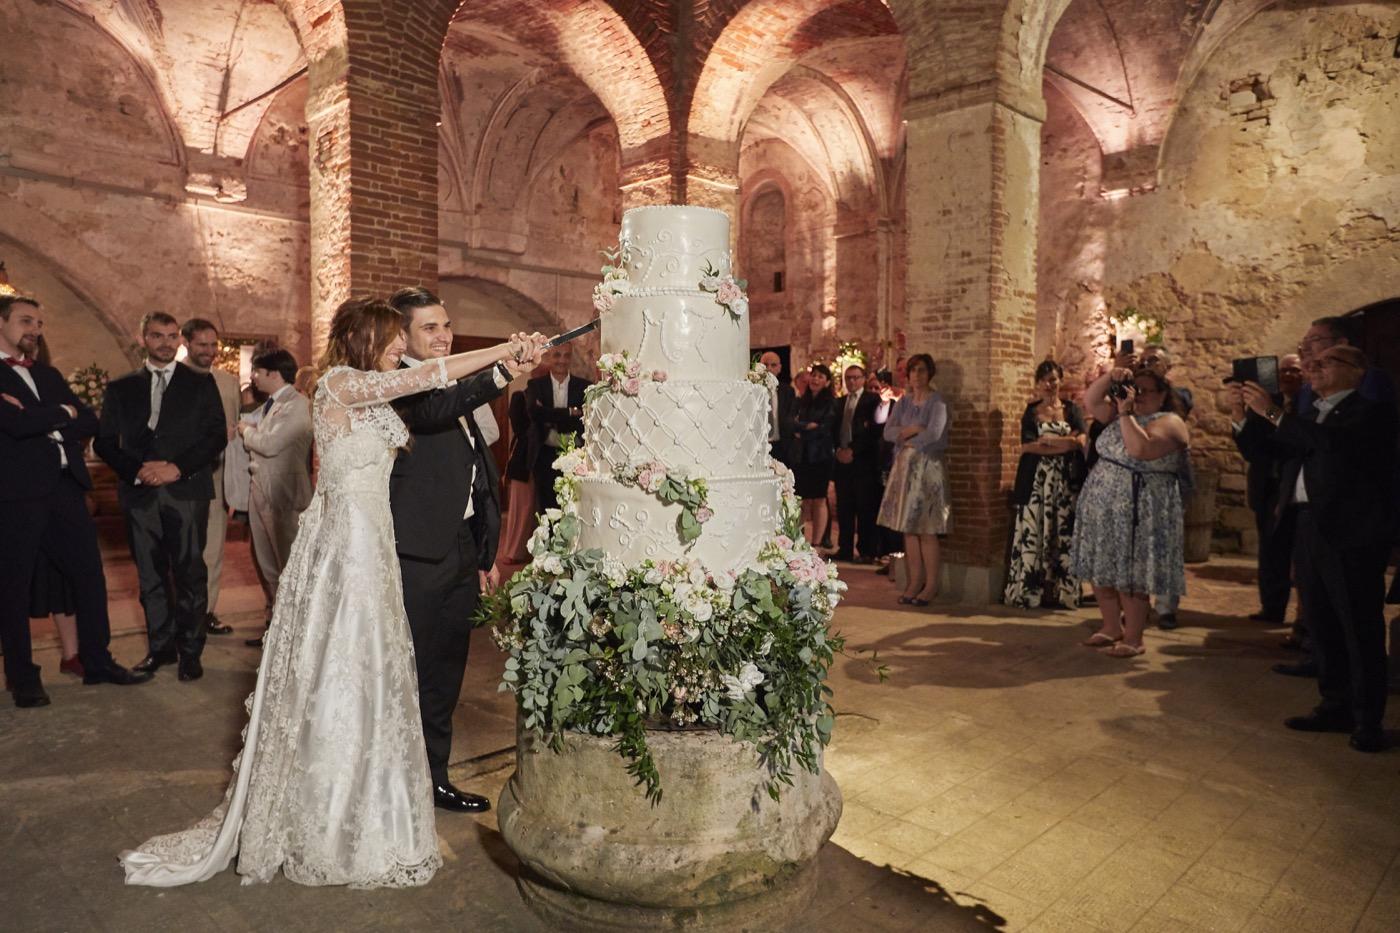 Claudio-Coppola-wedding-photographer-abbazia-7-frati-piegaro-87